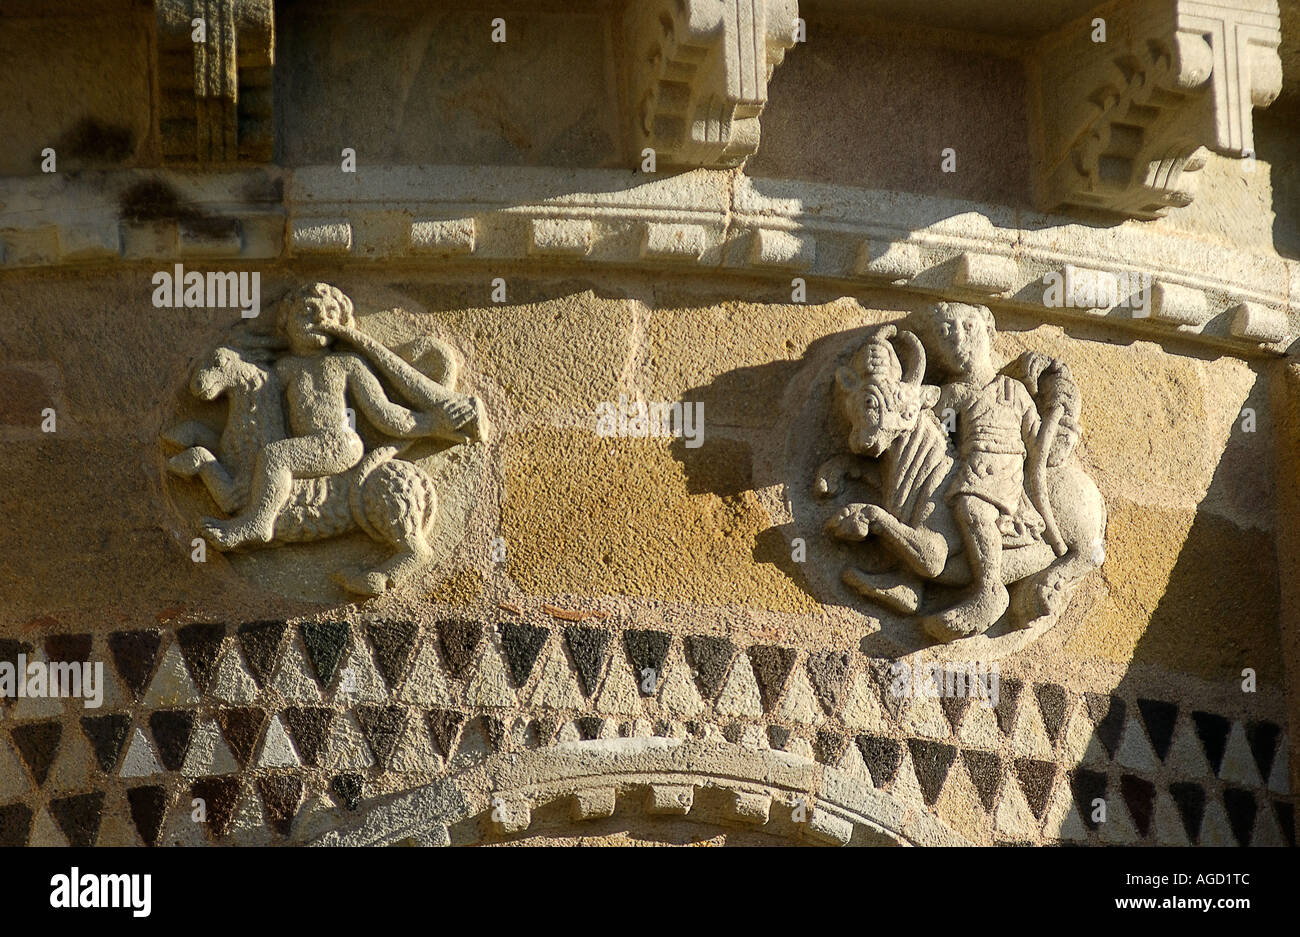 Zodiac sign carving on the Romanesque church of Saint-Austremoine d'Issoire, Issoire, Auvergne, France, Europe - Stock Image